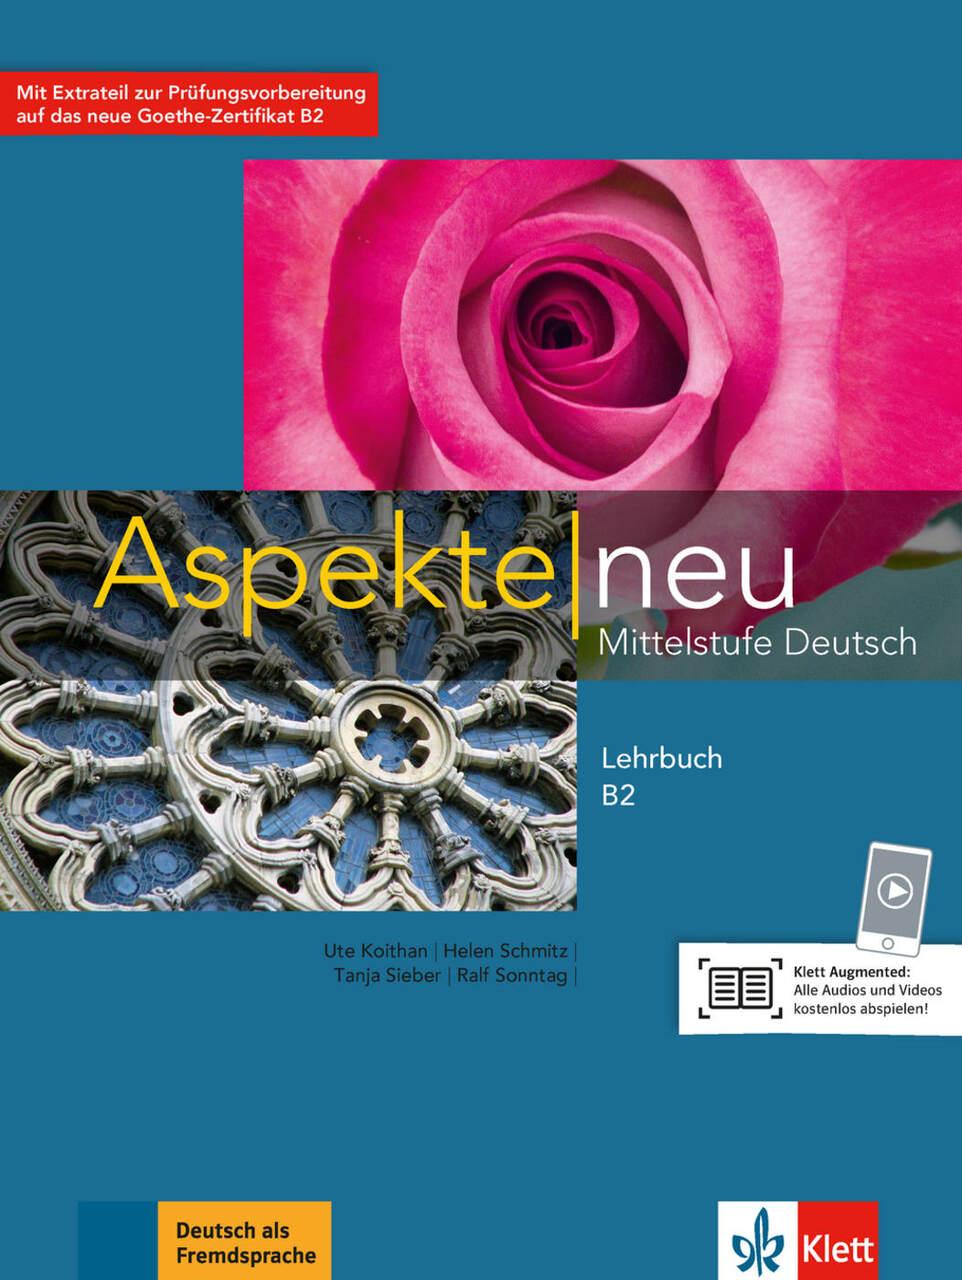 Aspekte Neu B2 Kartoniertes Buch Buchhandlung St Johann Gmbh